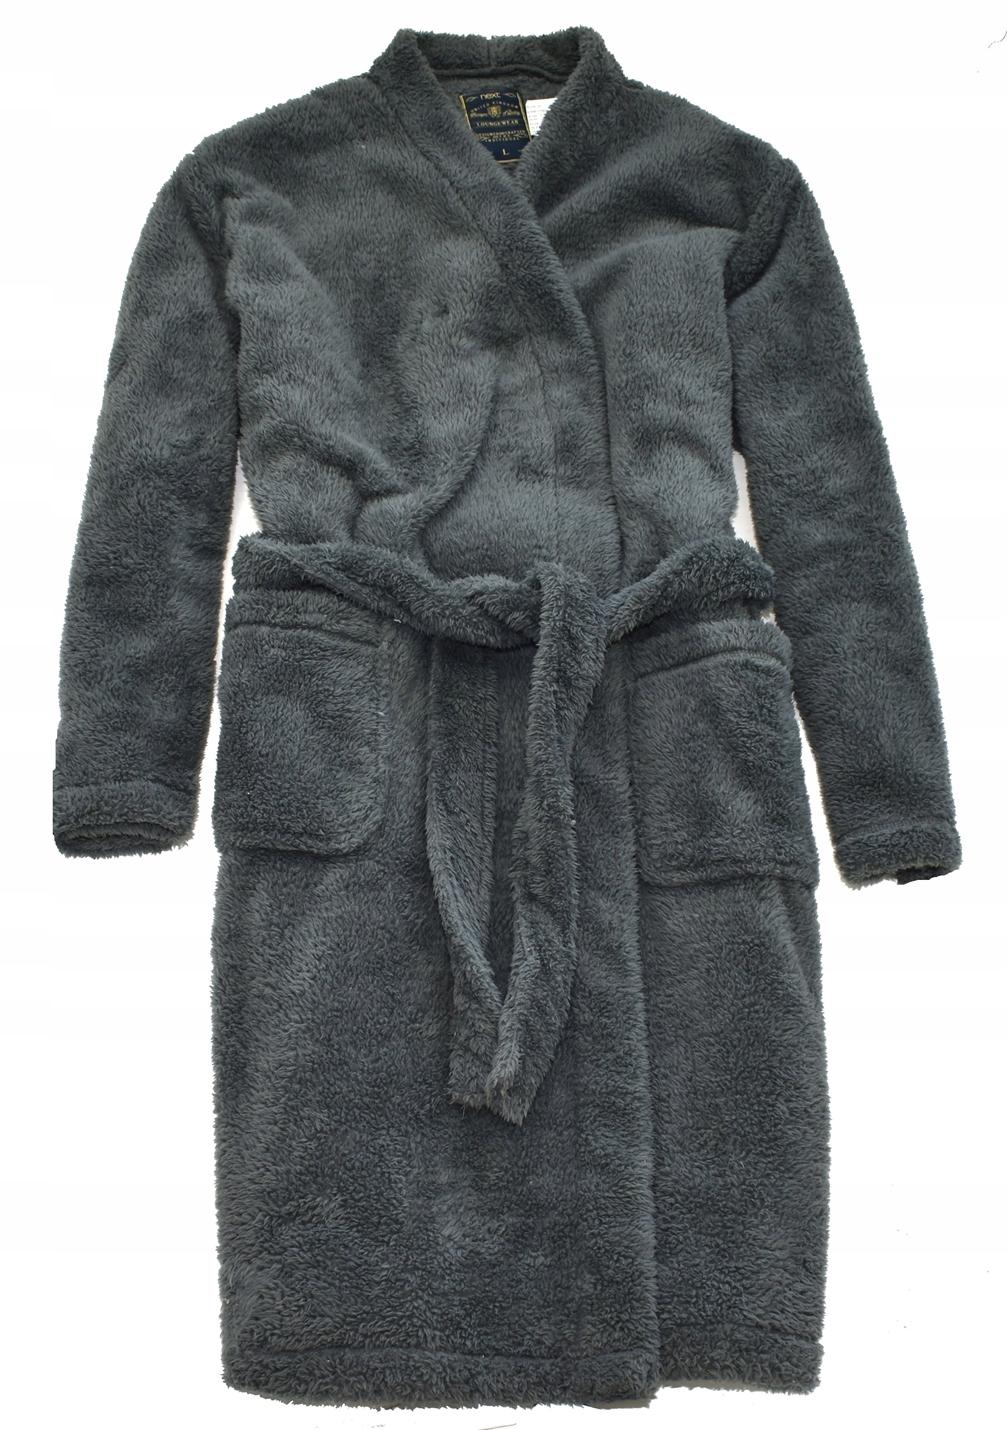 MM 384 NEXT_ORGINAL WARM GREY DRESSING GOWN_L